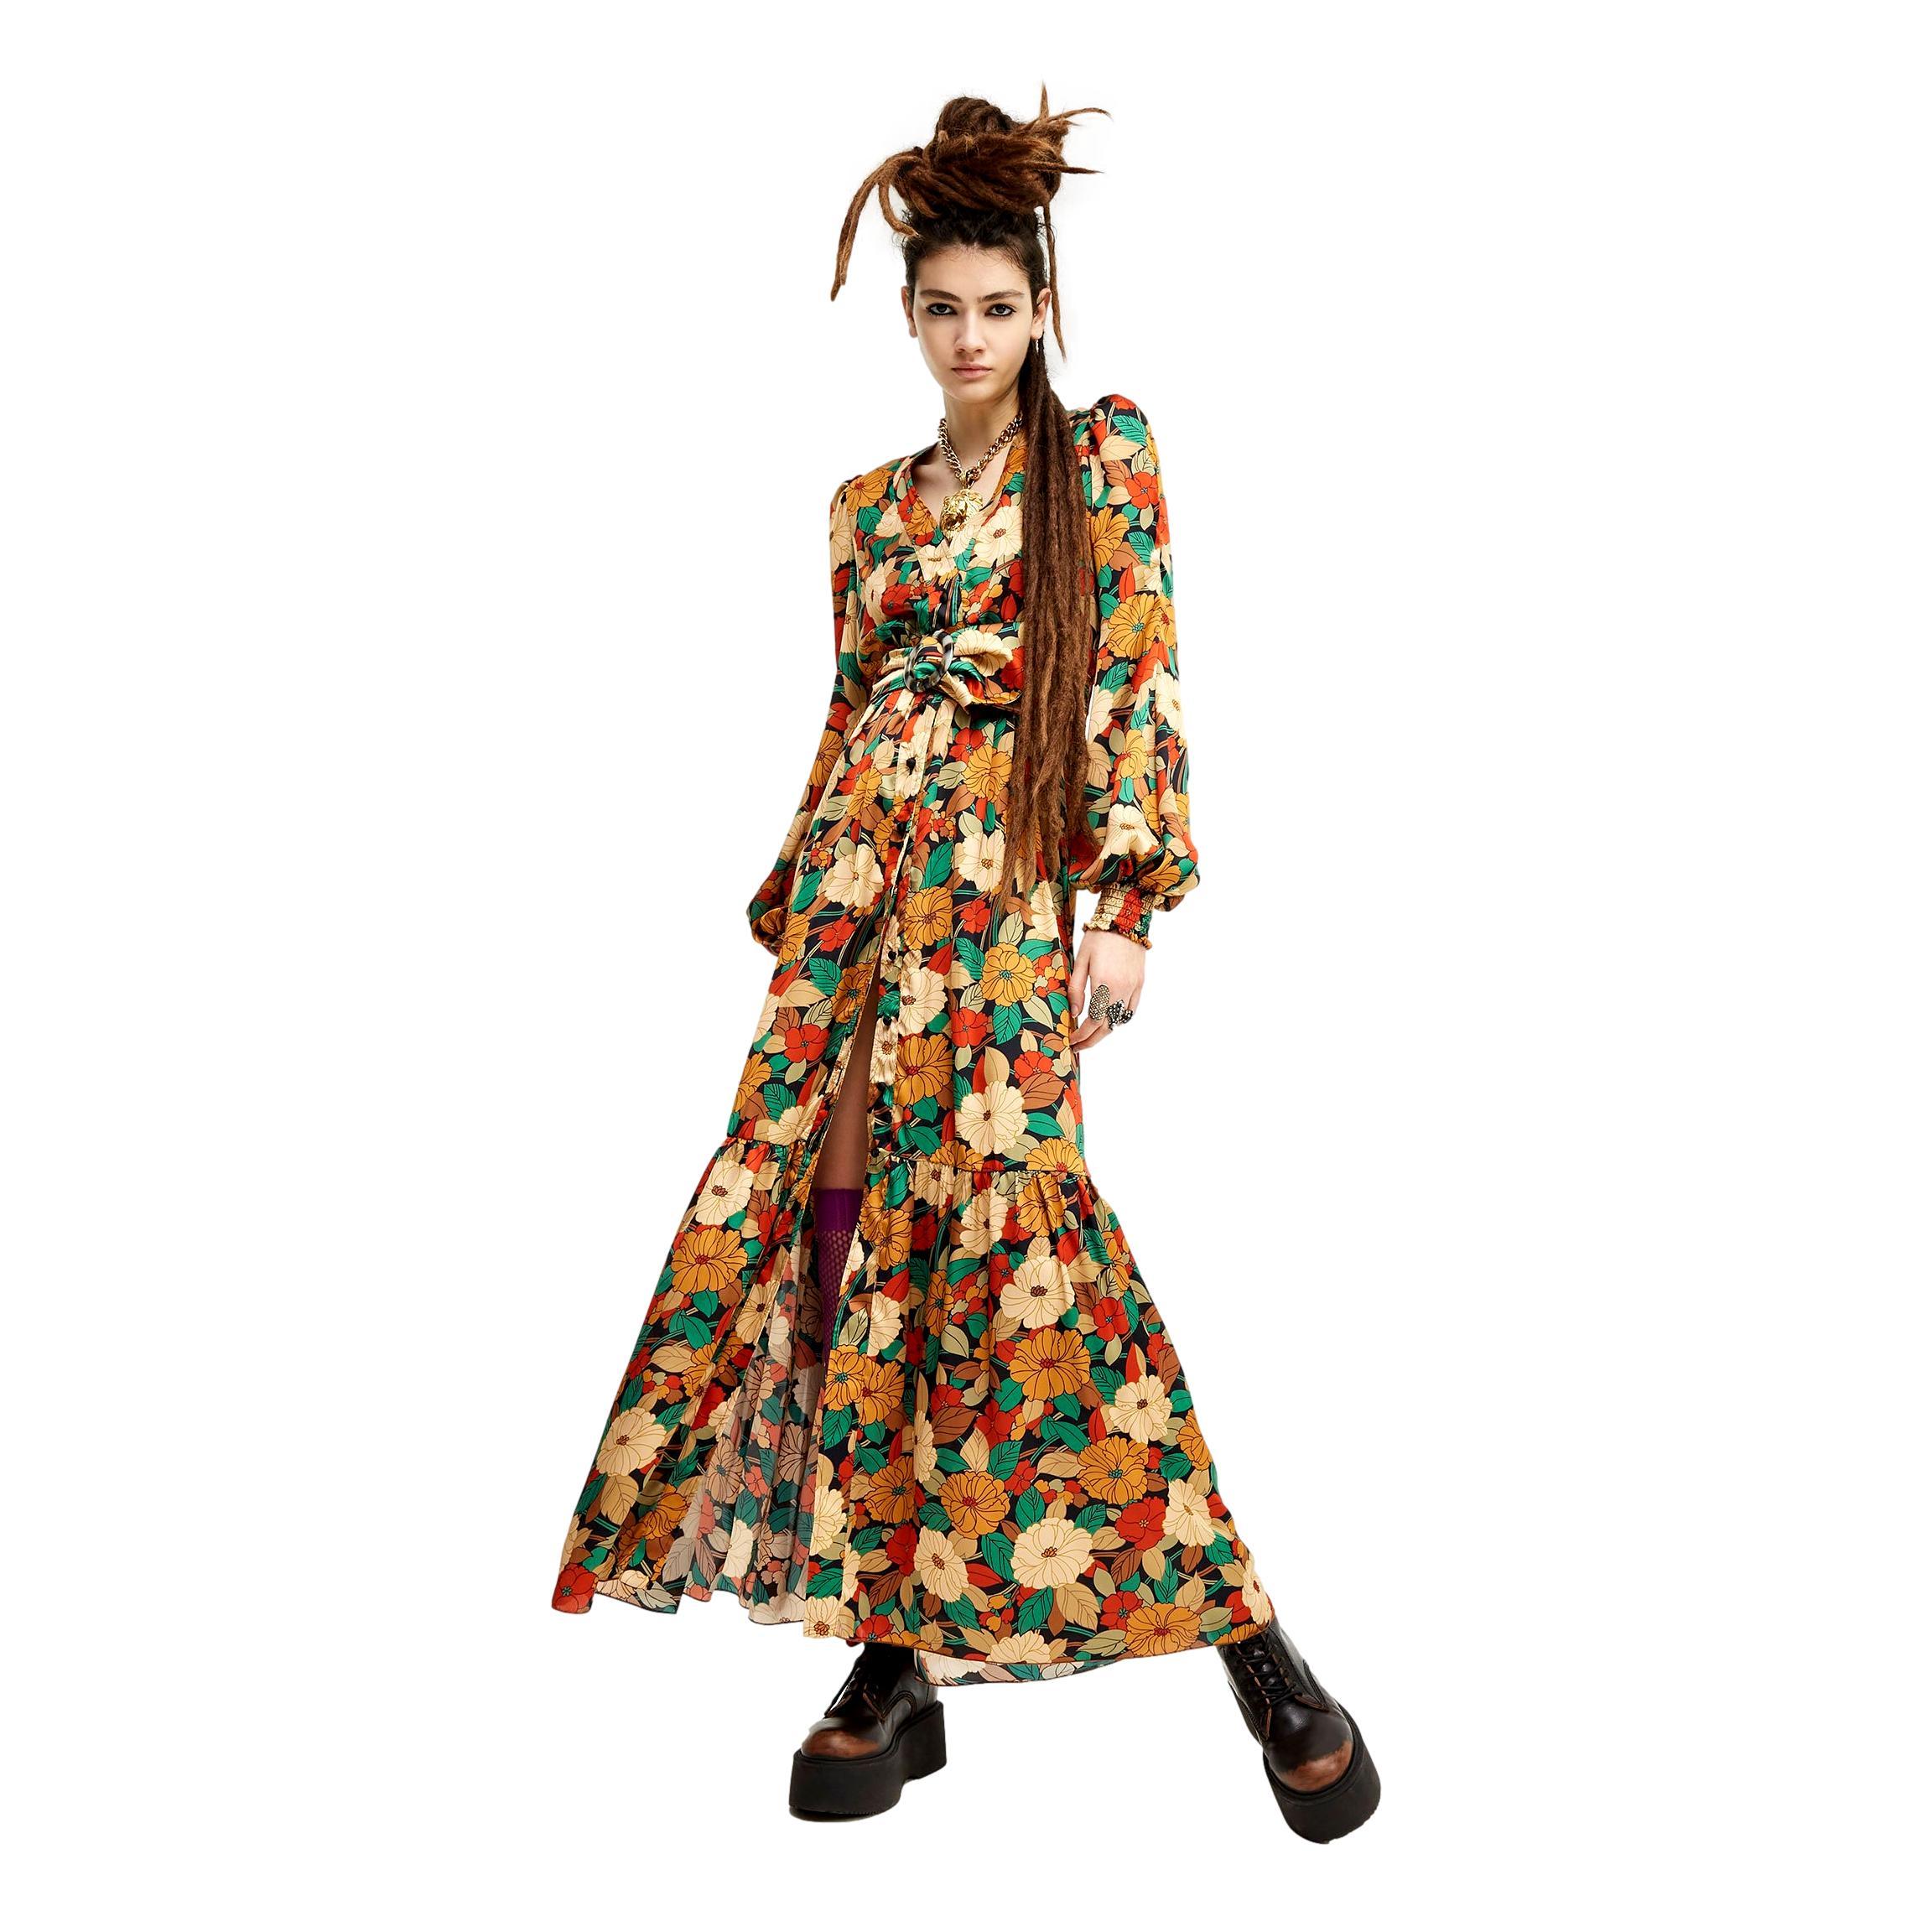 LONG DRESS BLOSSOM ANIYE BY ANIYE BY      18126201791